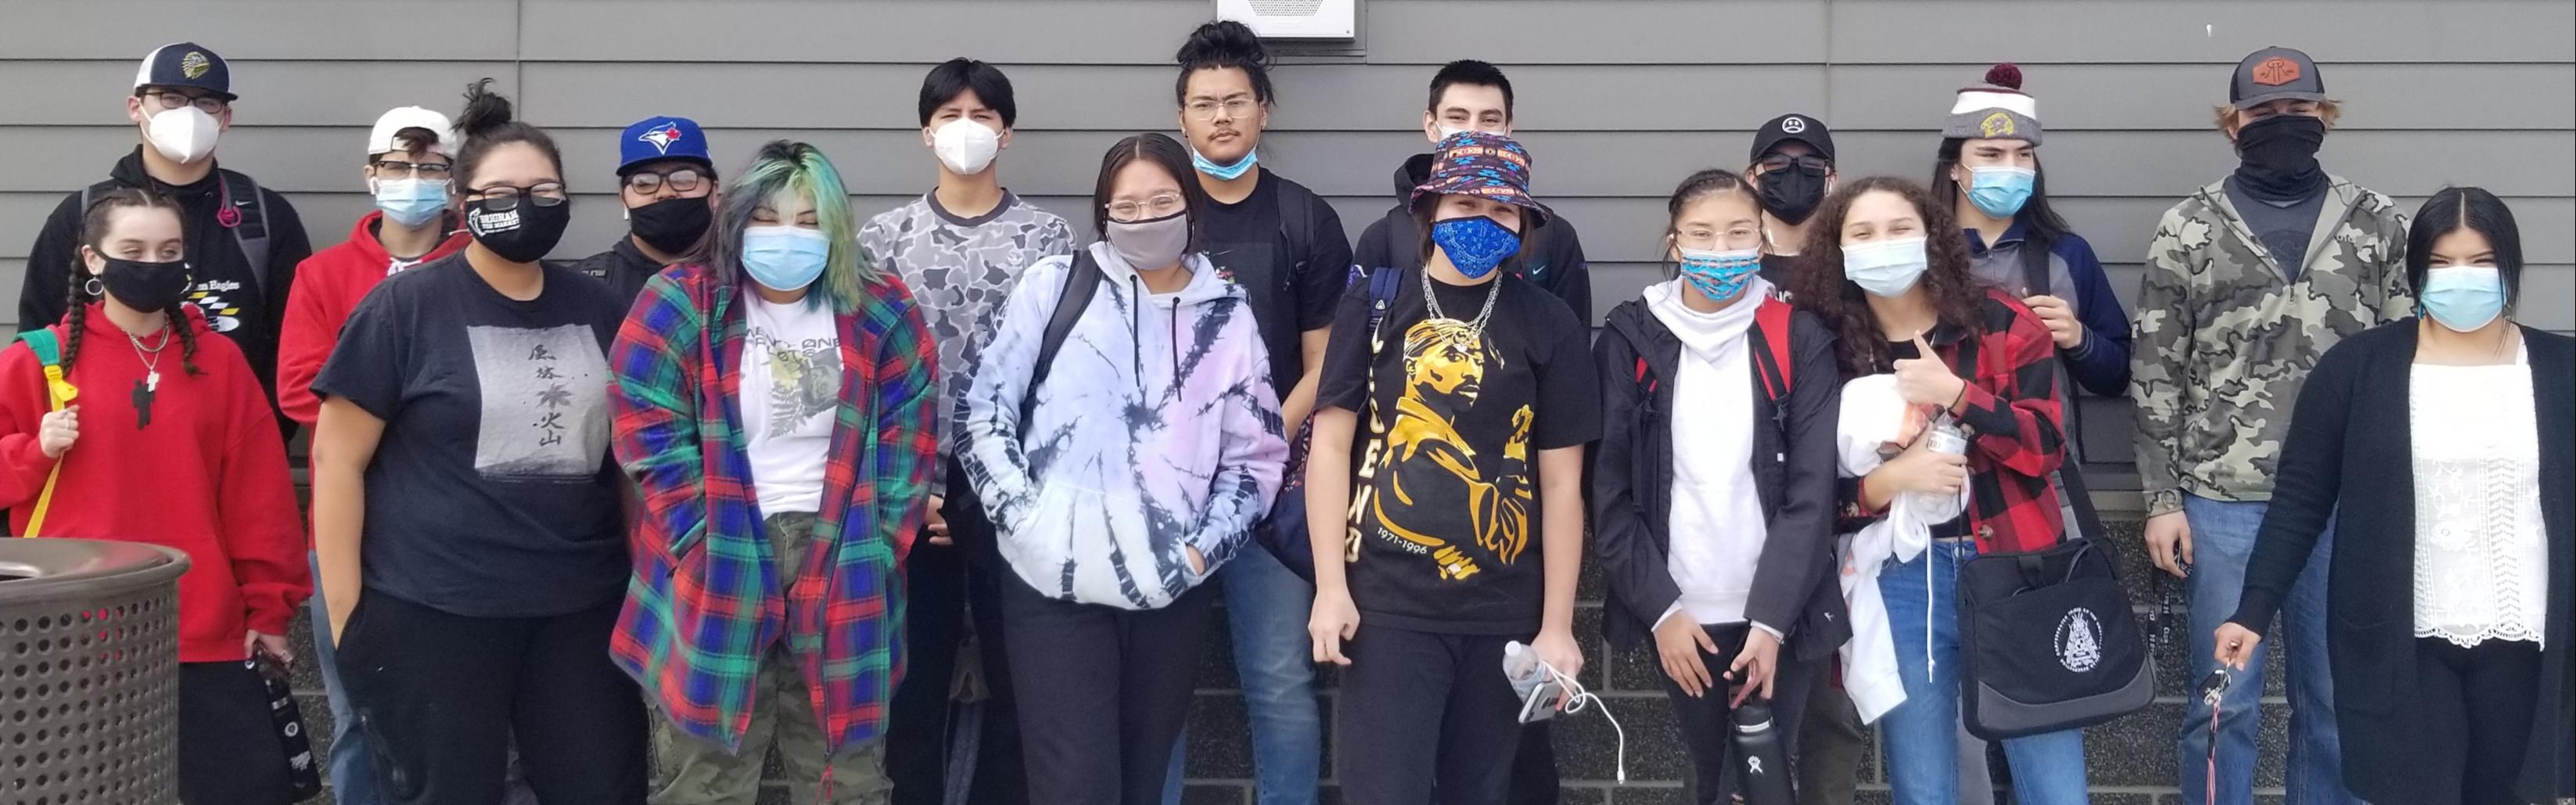 seniors with masks